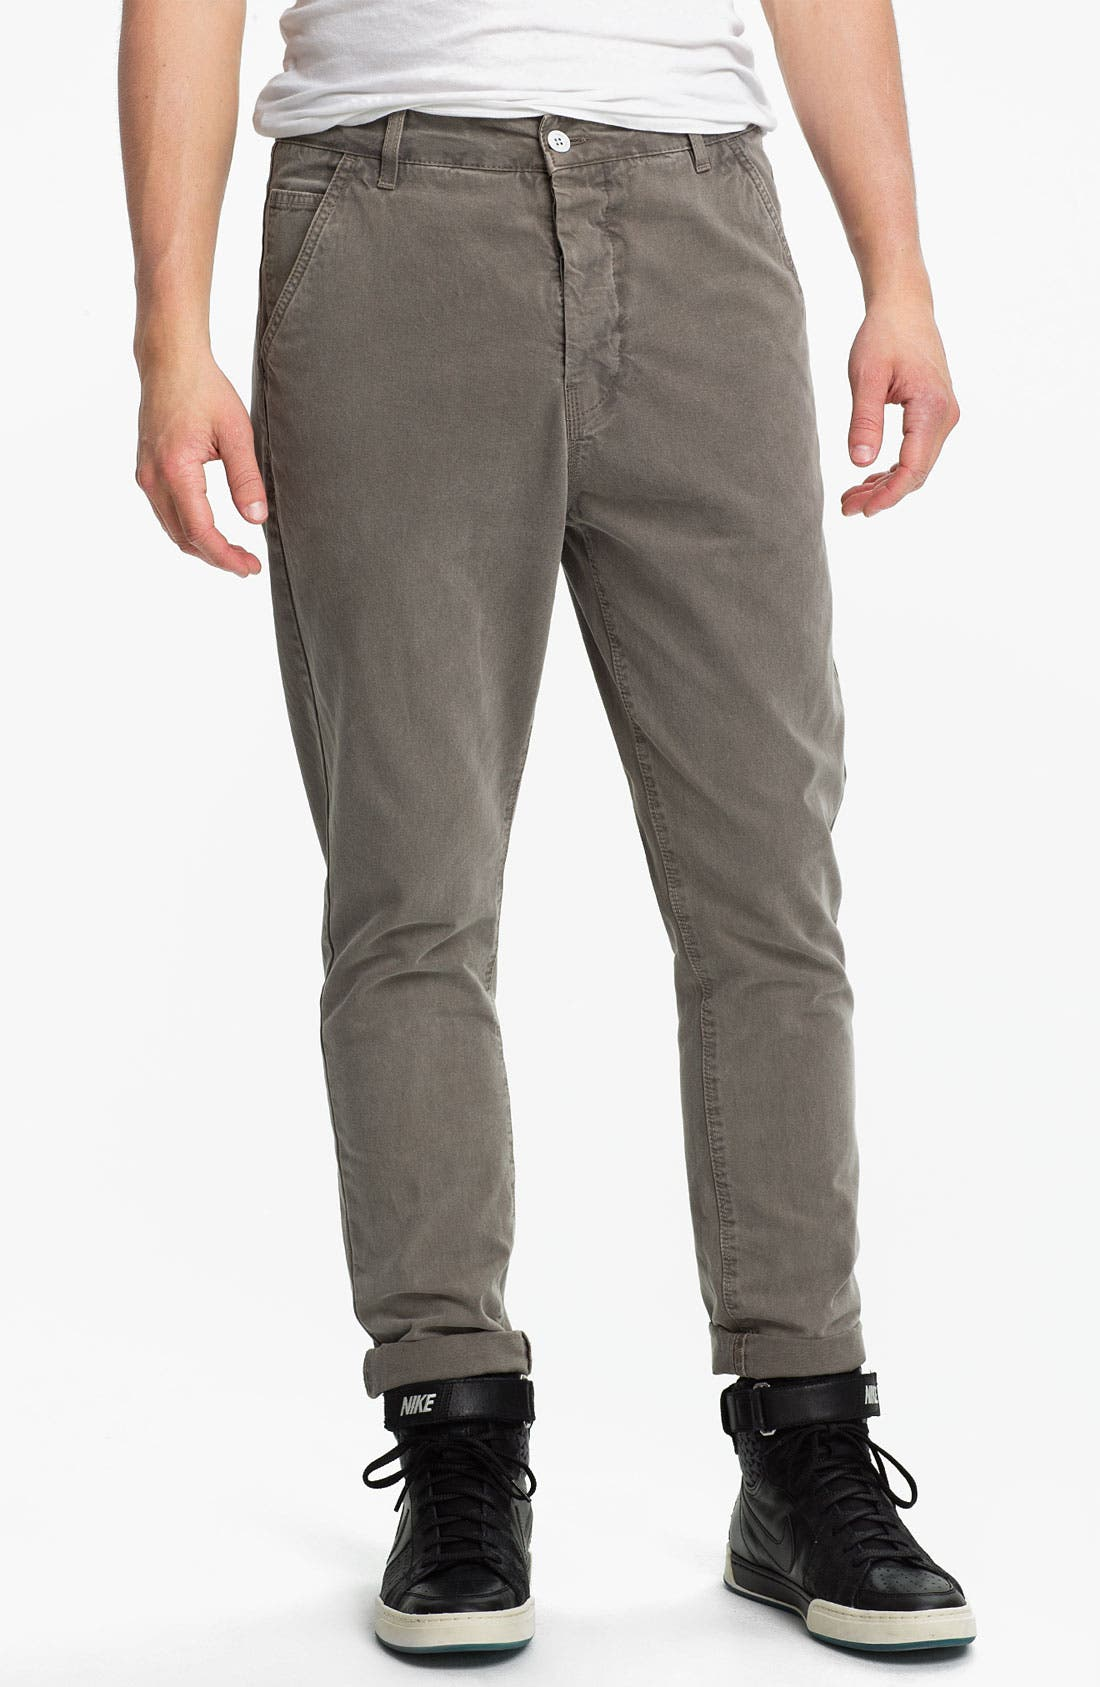 Skinny Carrot Fit Pants,                             Main thumbnail 1, color,                             030